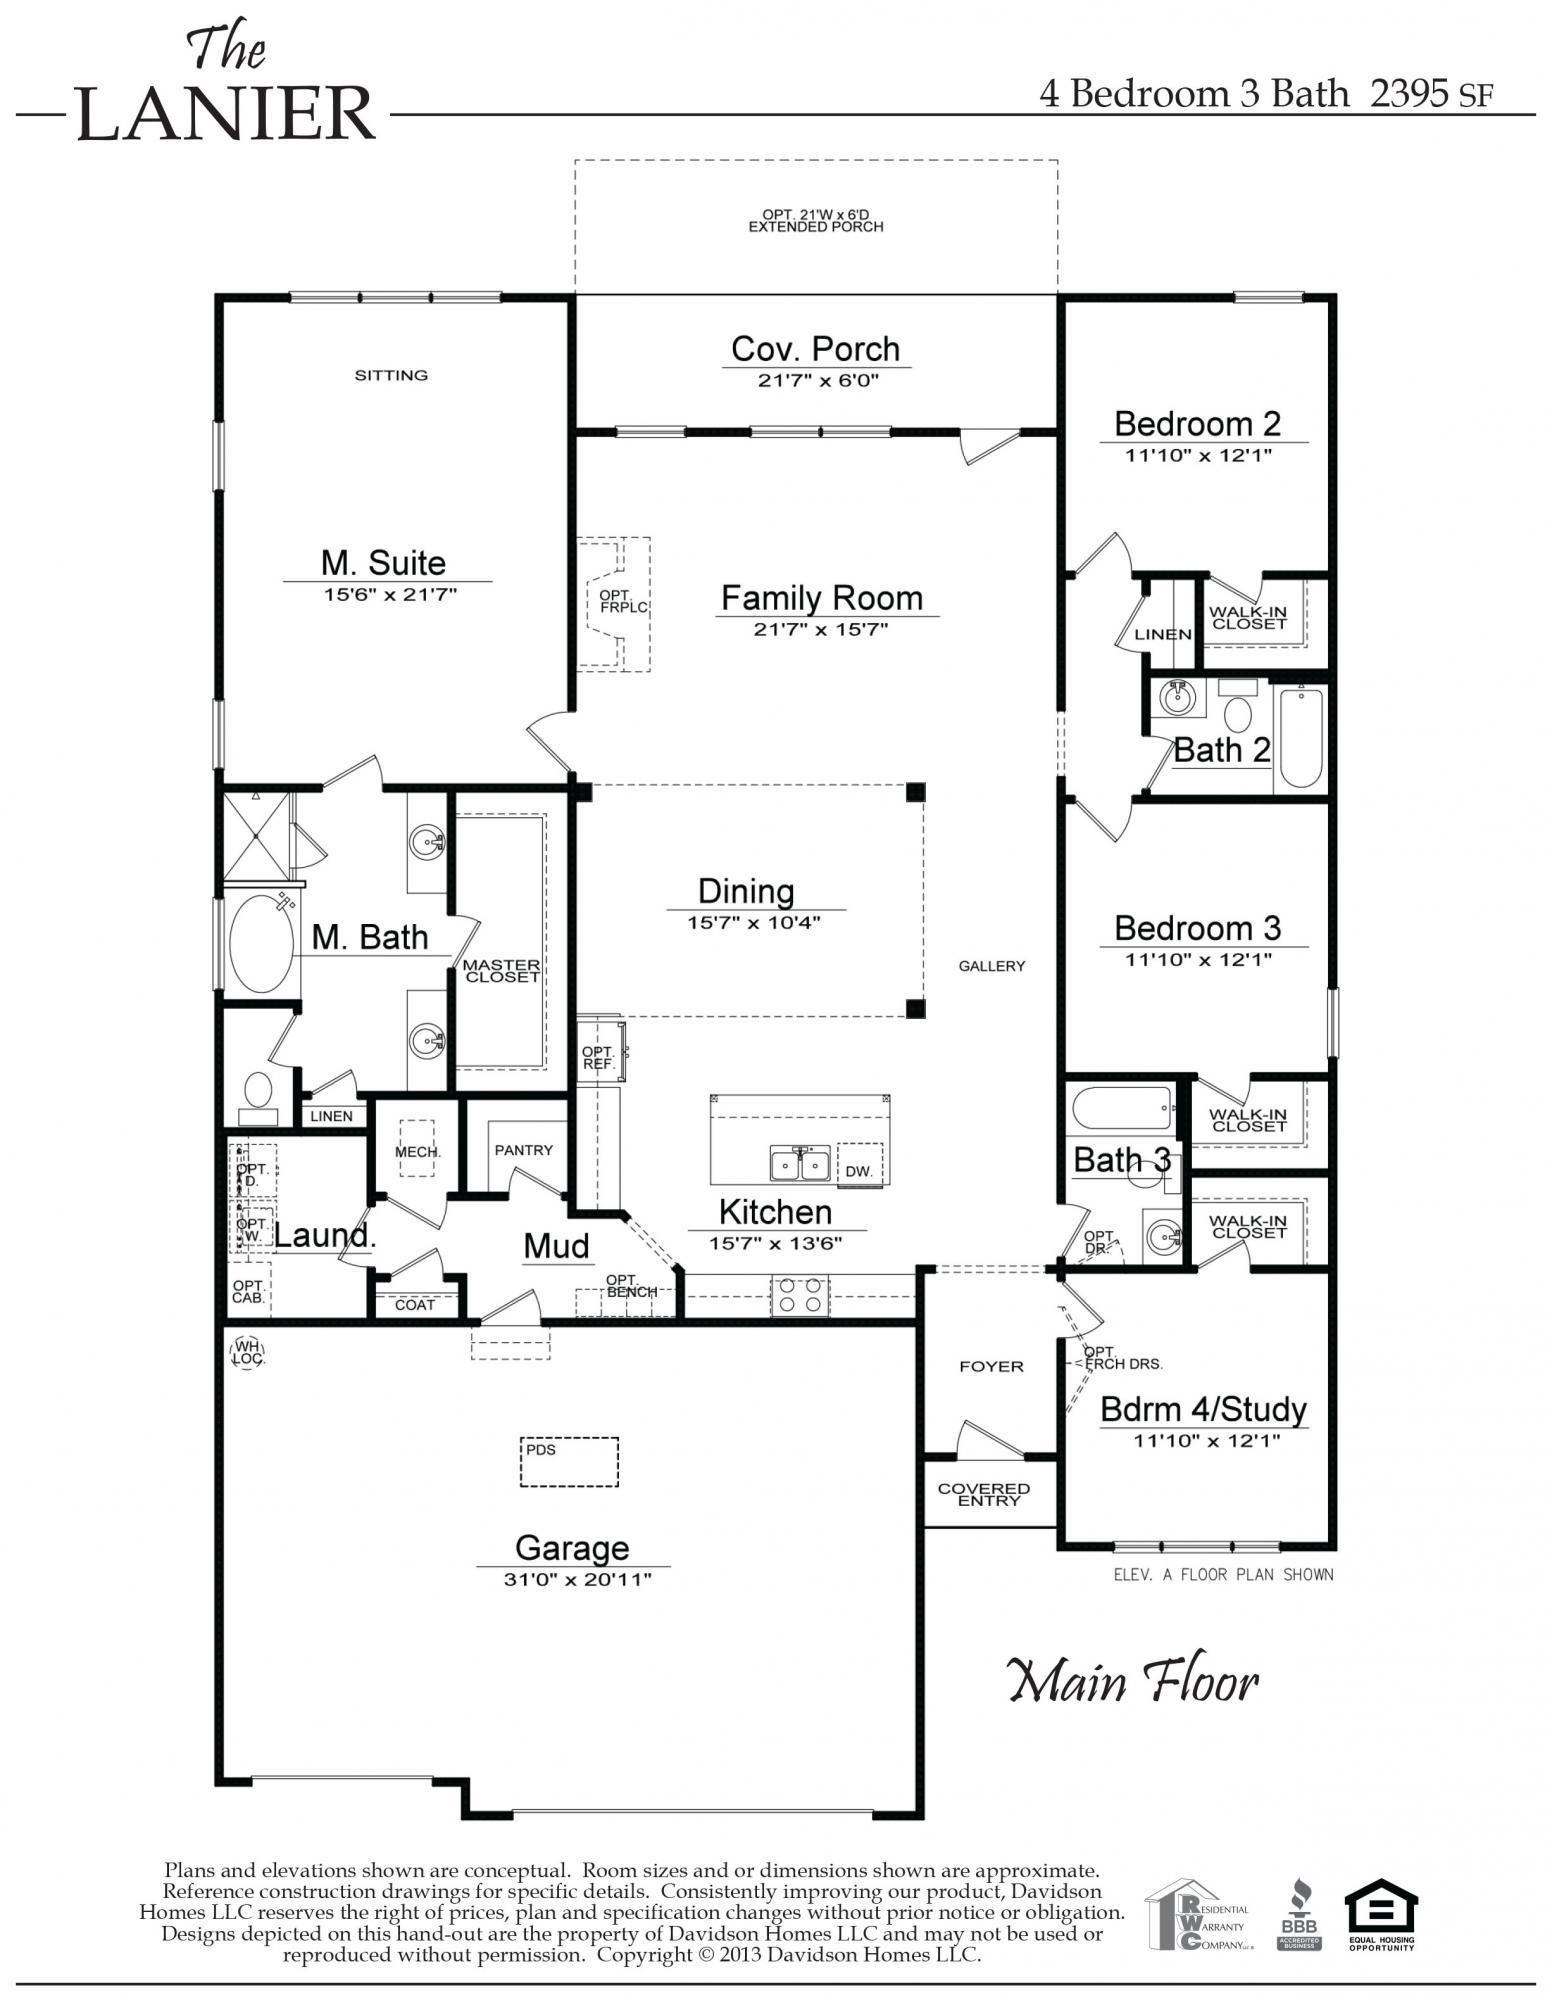 The Lanier Al New Home Construction Davidson Homes 2395 Sq Ft House Floor Plans House Plans Dream House Exterior